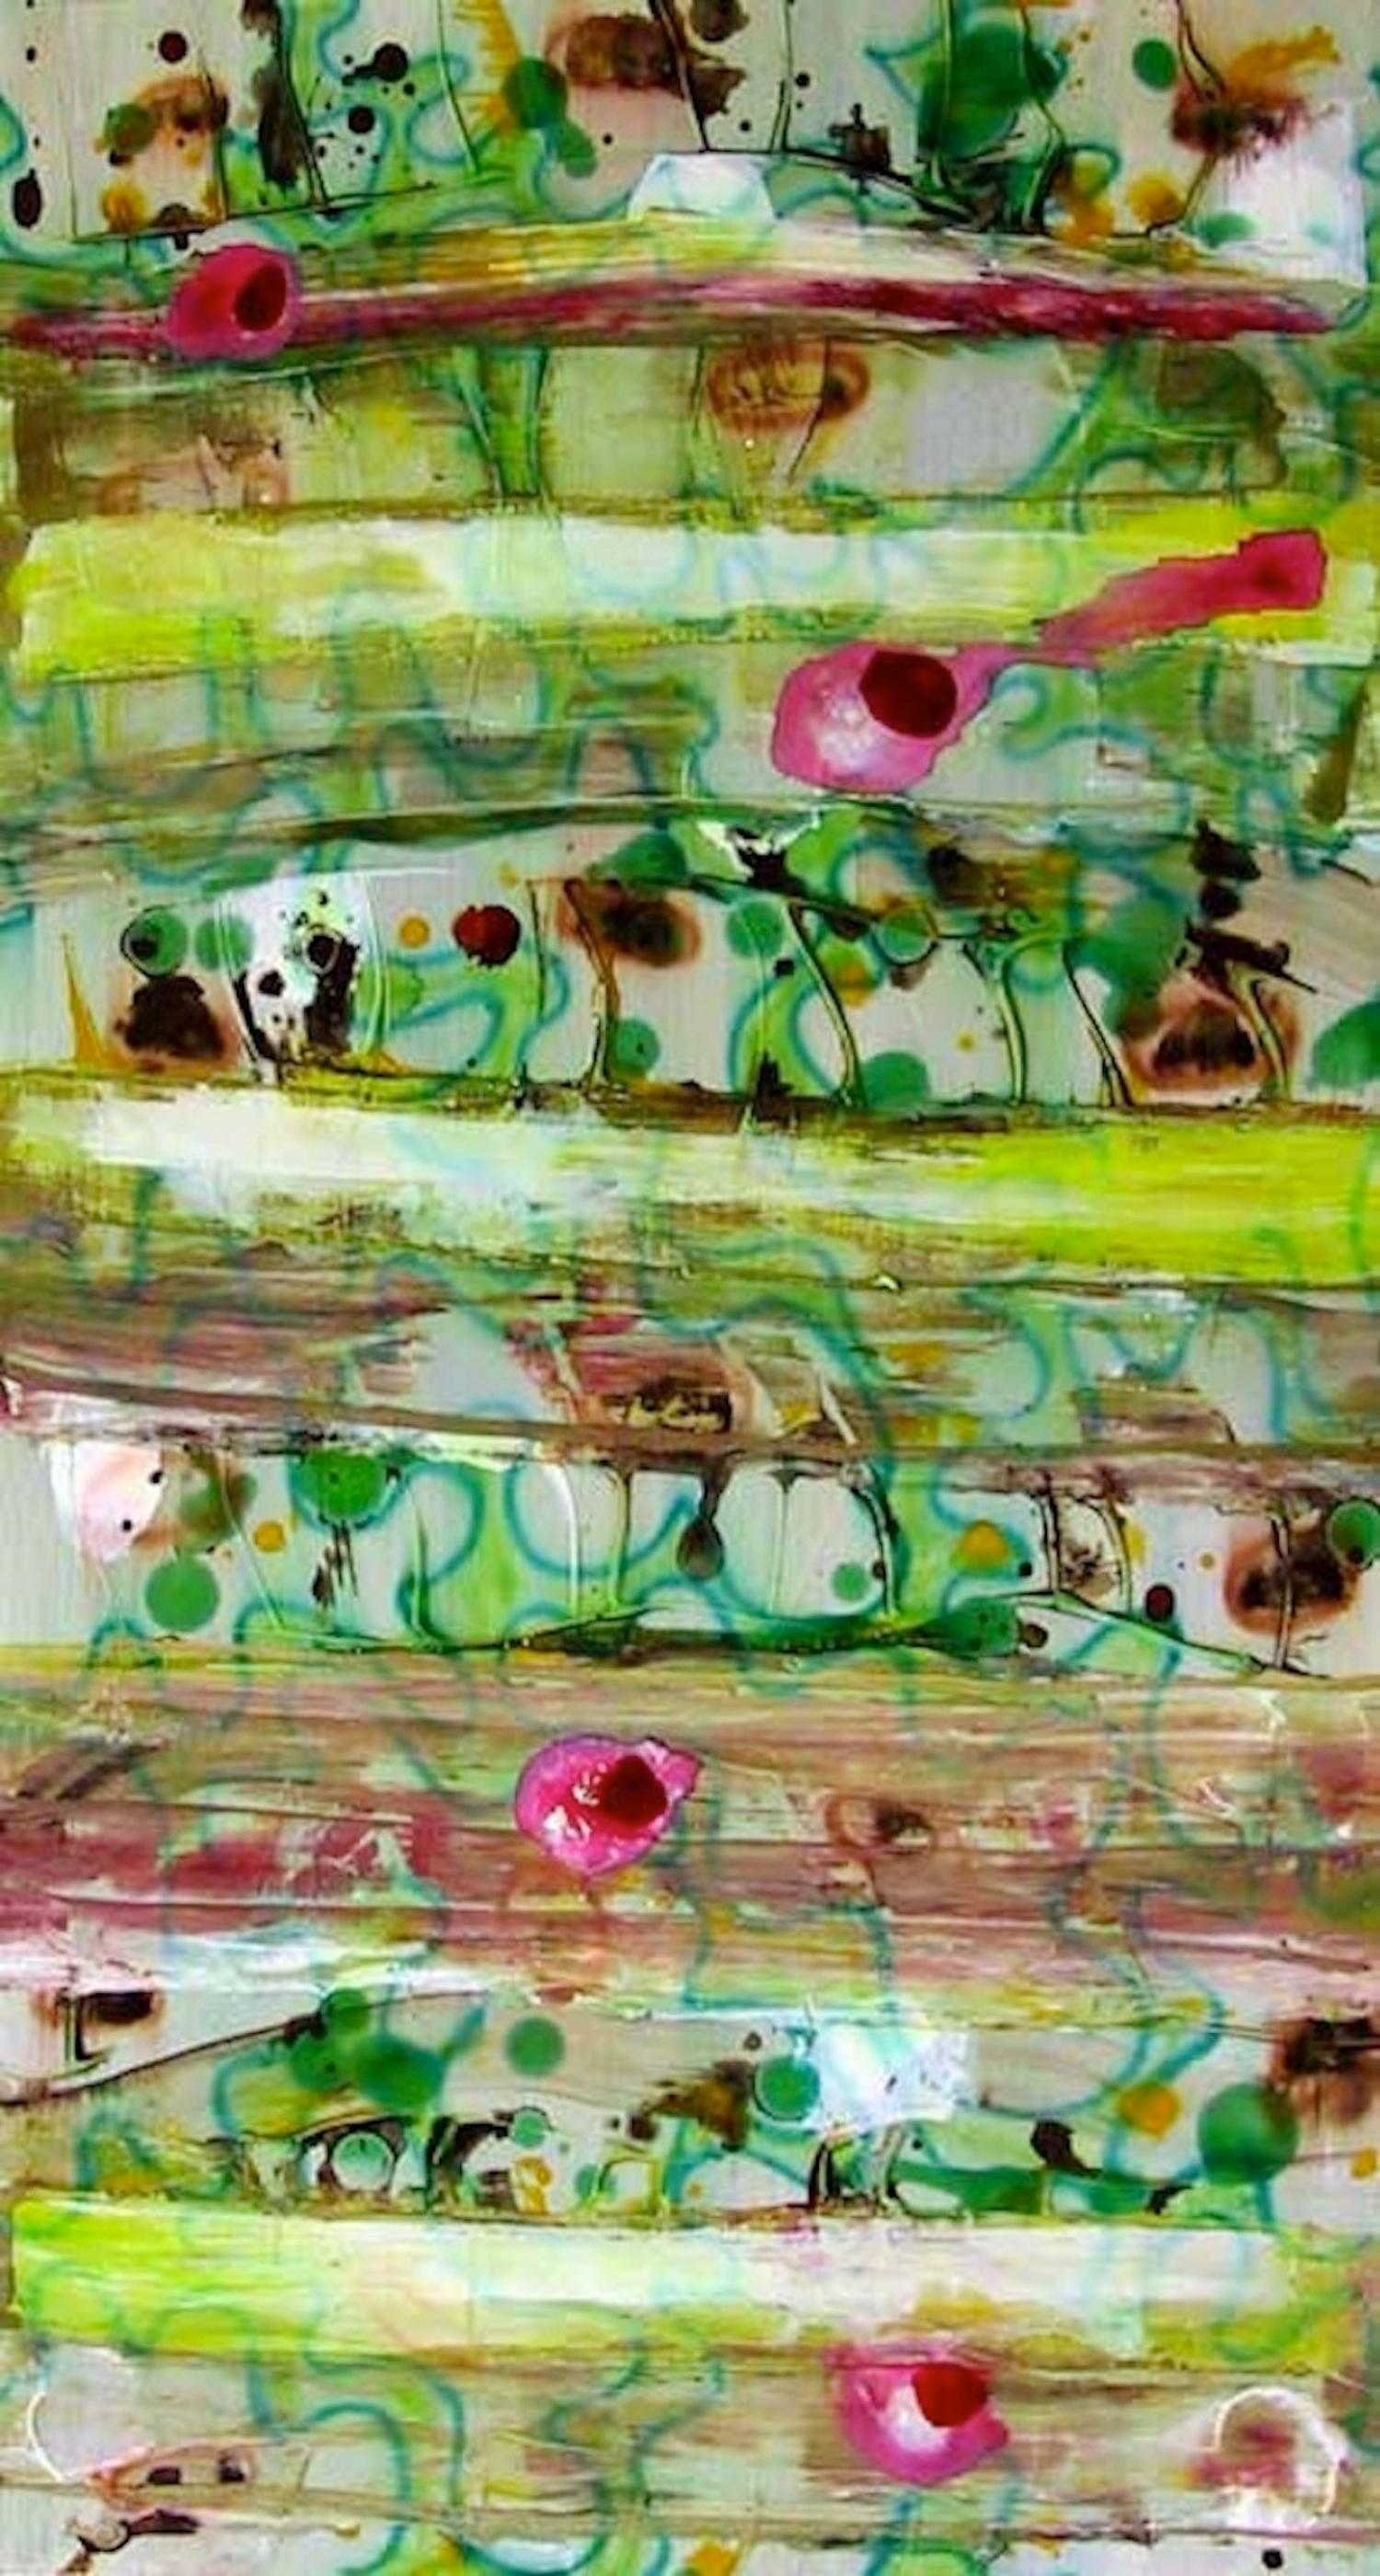 #42, bright green mixed media on paper, geometric pattern